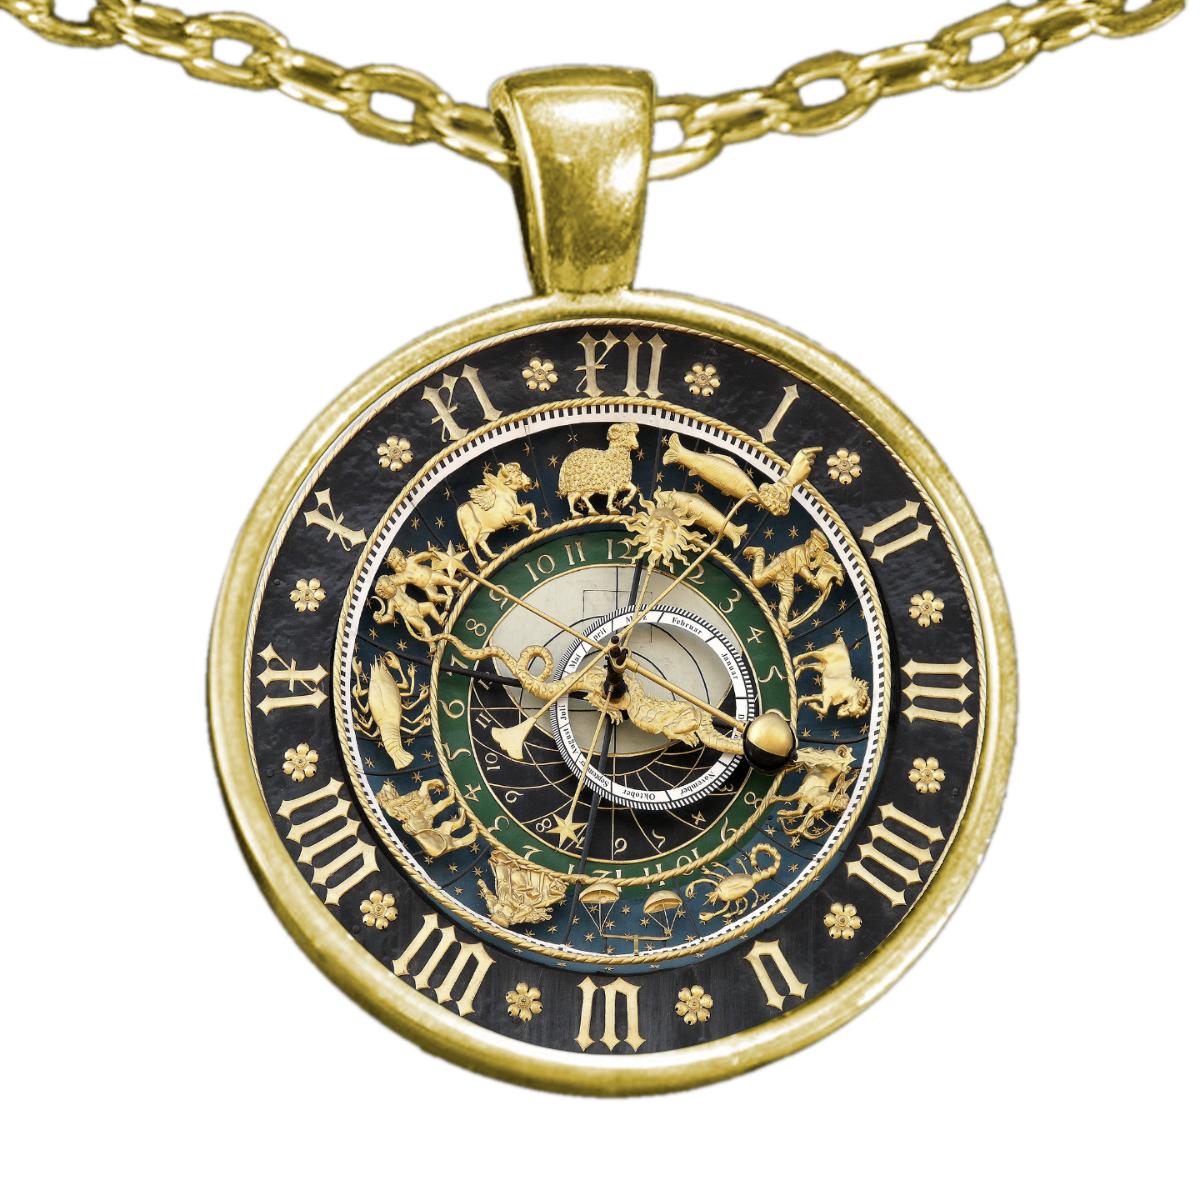 Ulm-Astronomical-Clock-Necklace